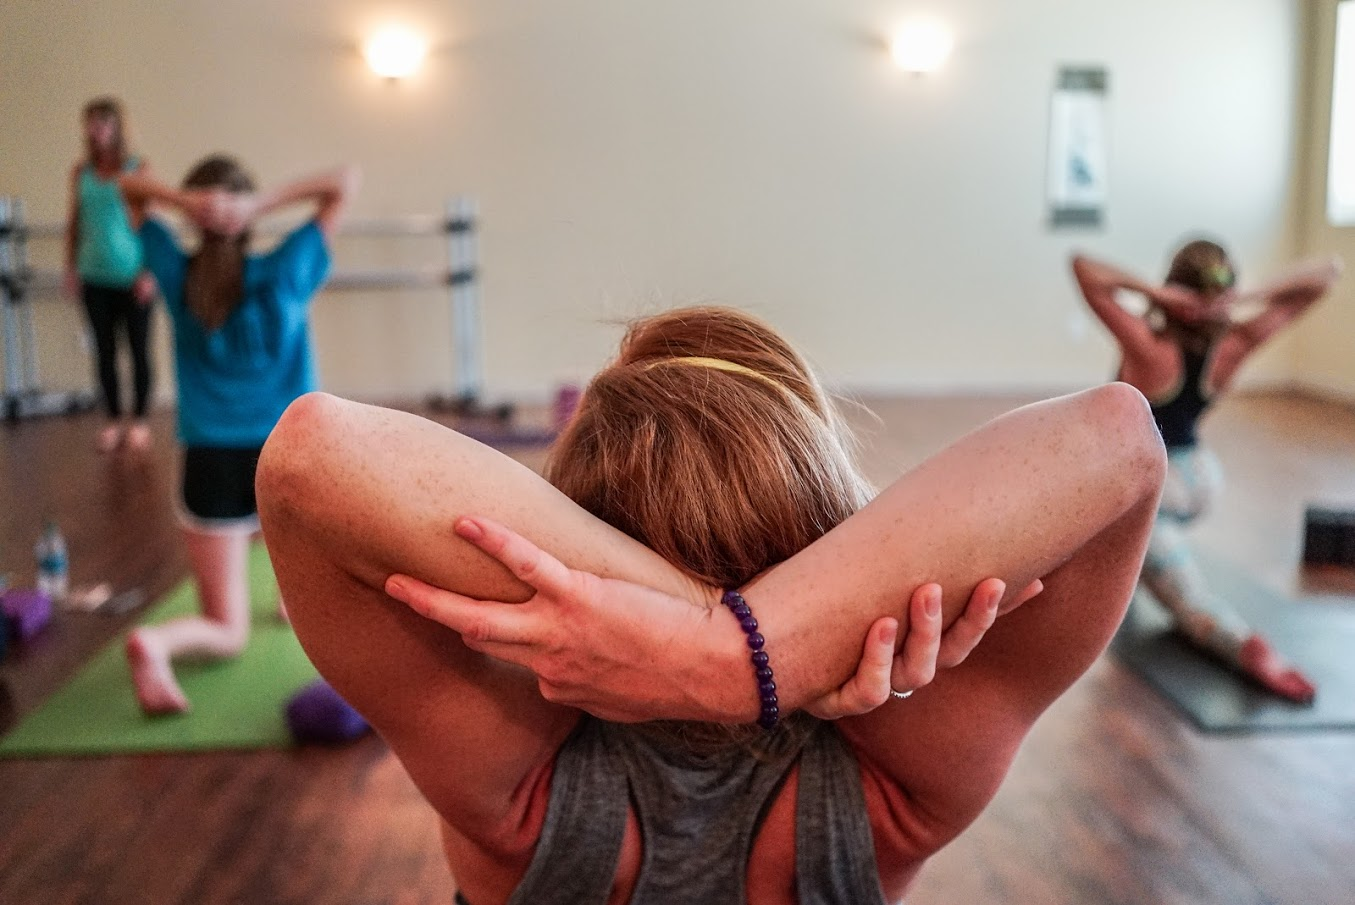 Brighton Yoga Center Photos (Edited)-9.jpg